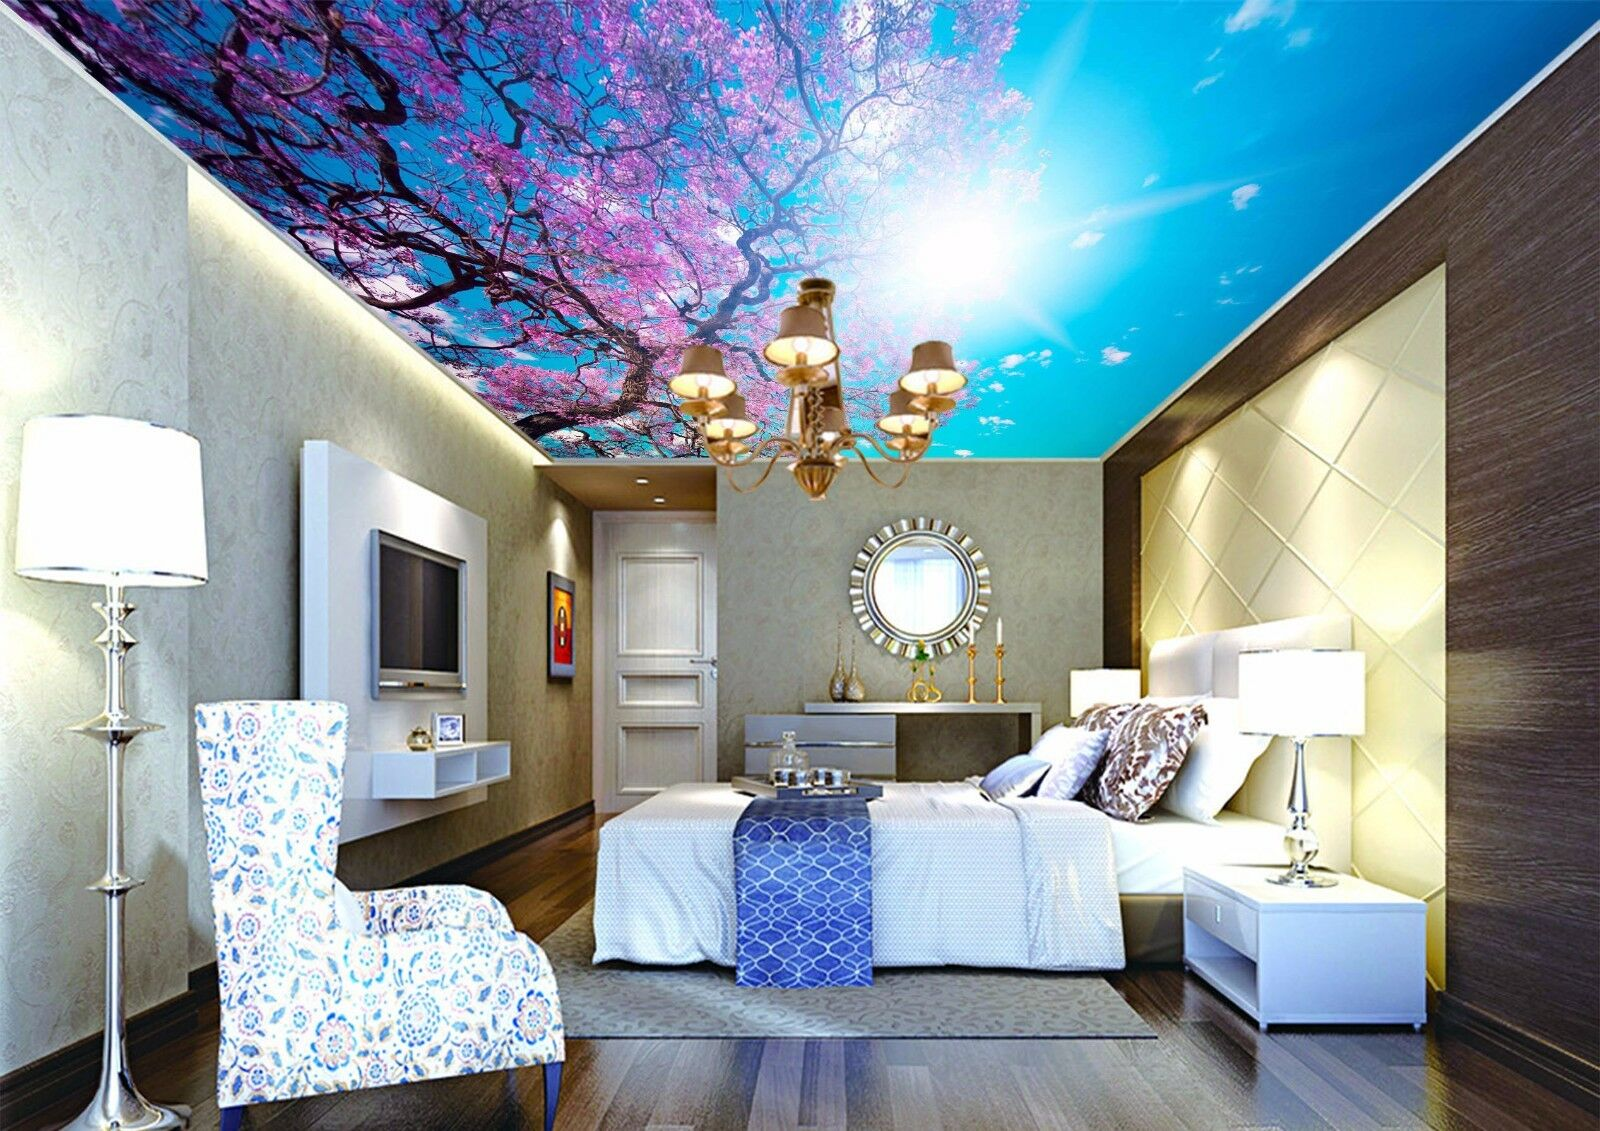 3D Sun Flowers 88 Ceiling WallPaper Murals Wall Print Decal Deco AJ WALLPAPER GB